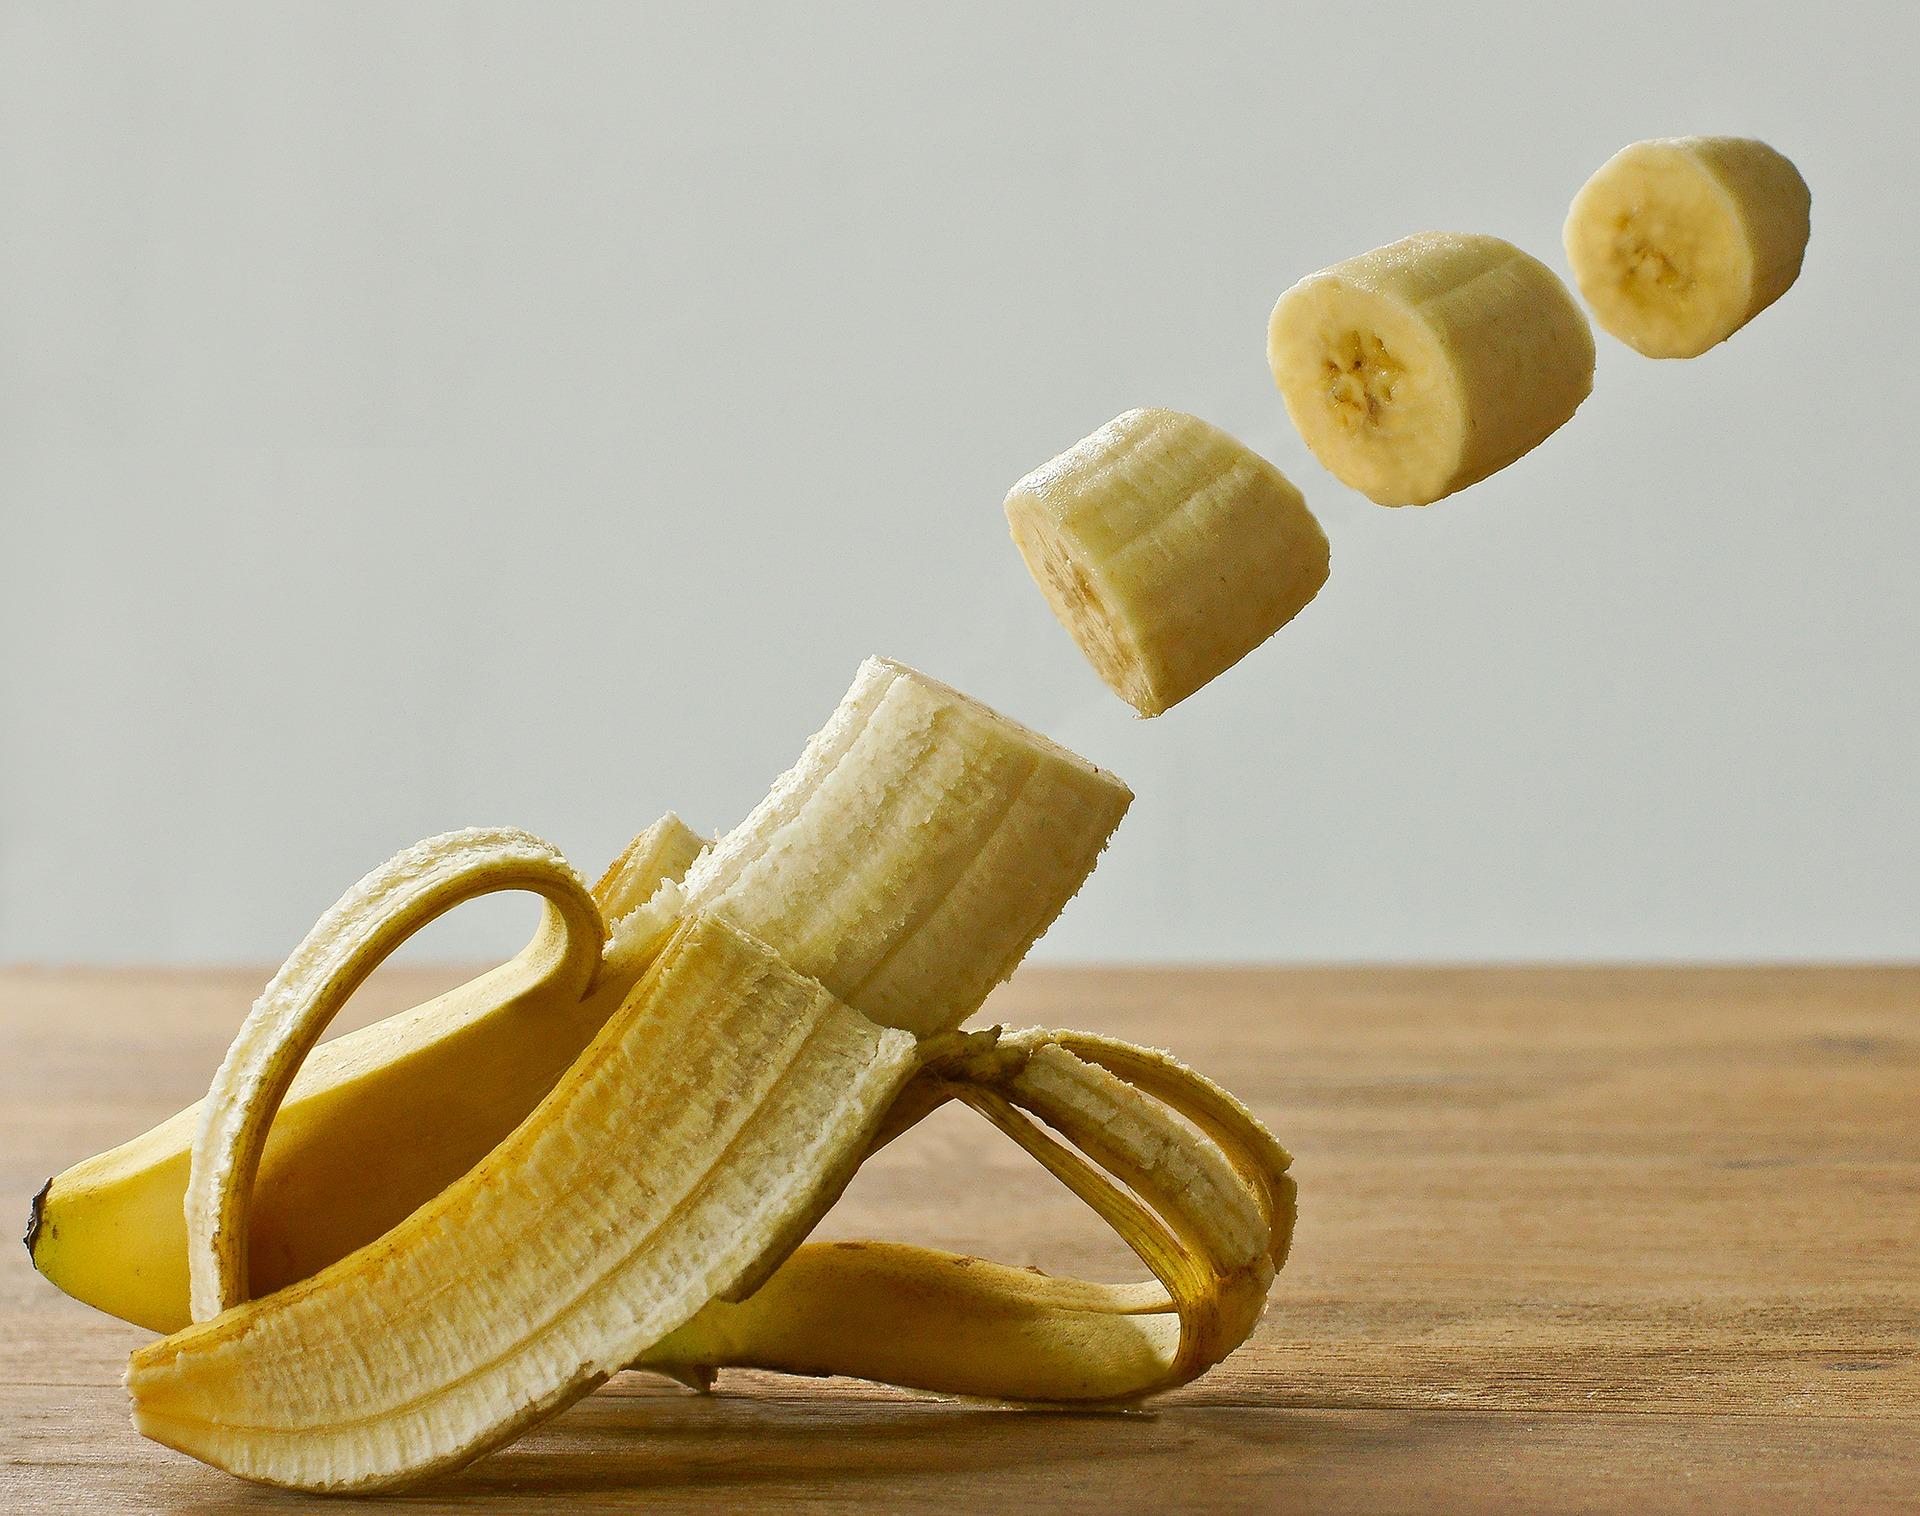 Giornata Mondiale della Banana